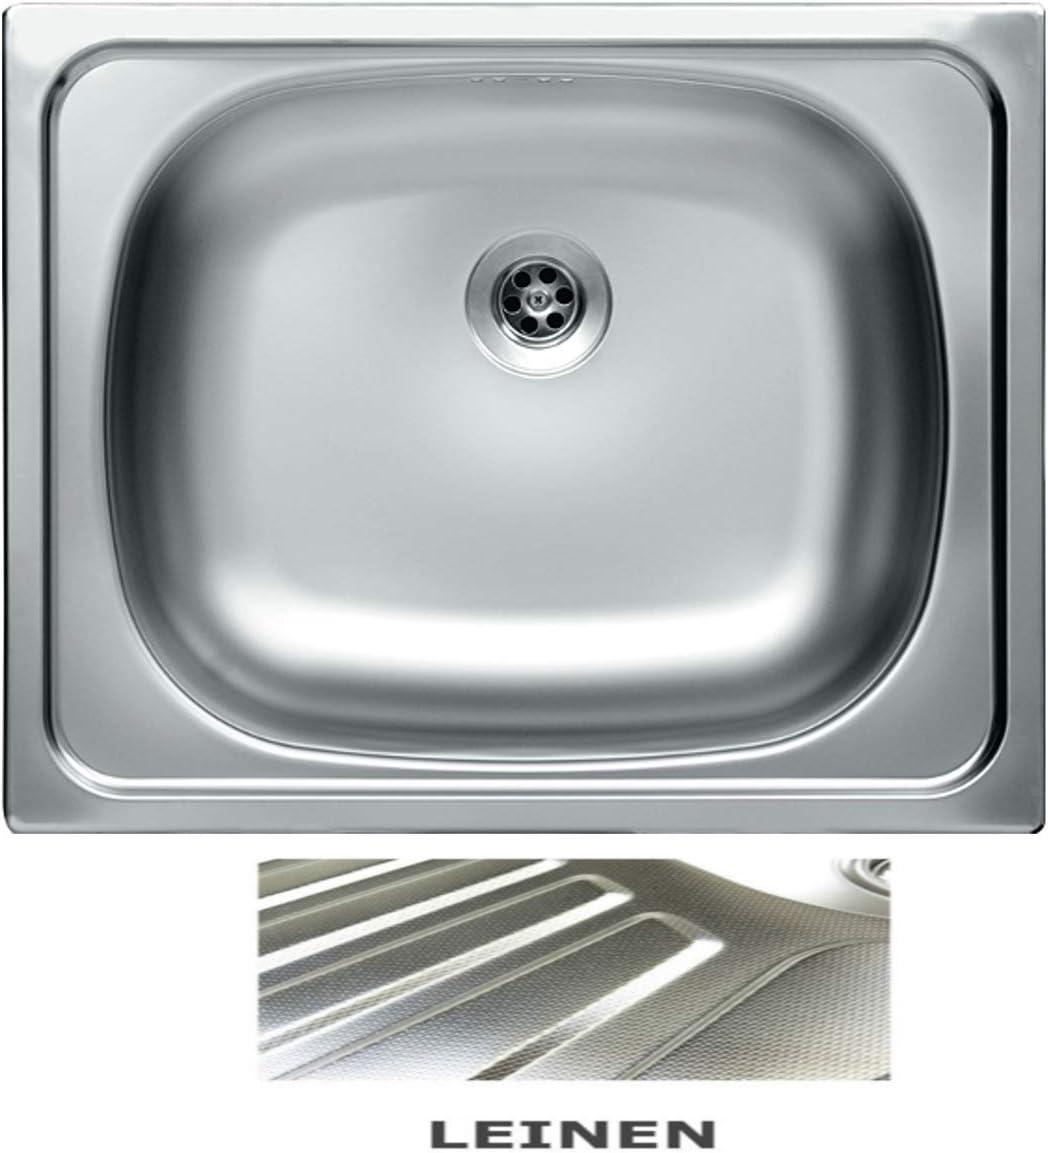 vbchome: fregadero de acero inoxidable fregadero – Estructura ...